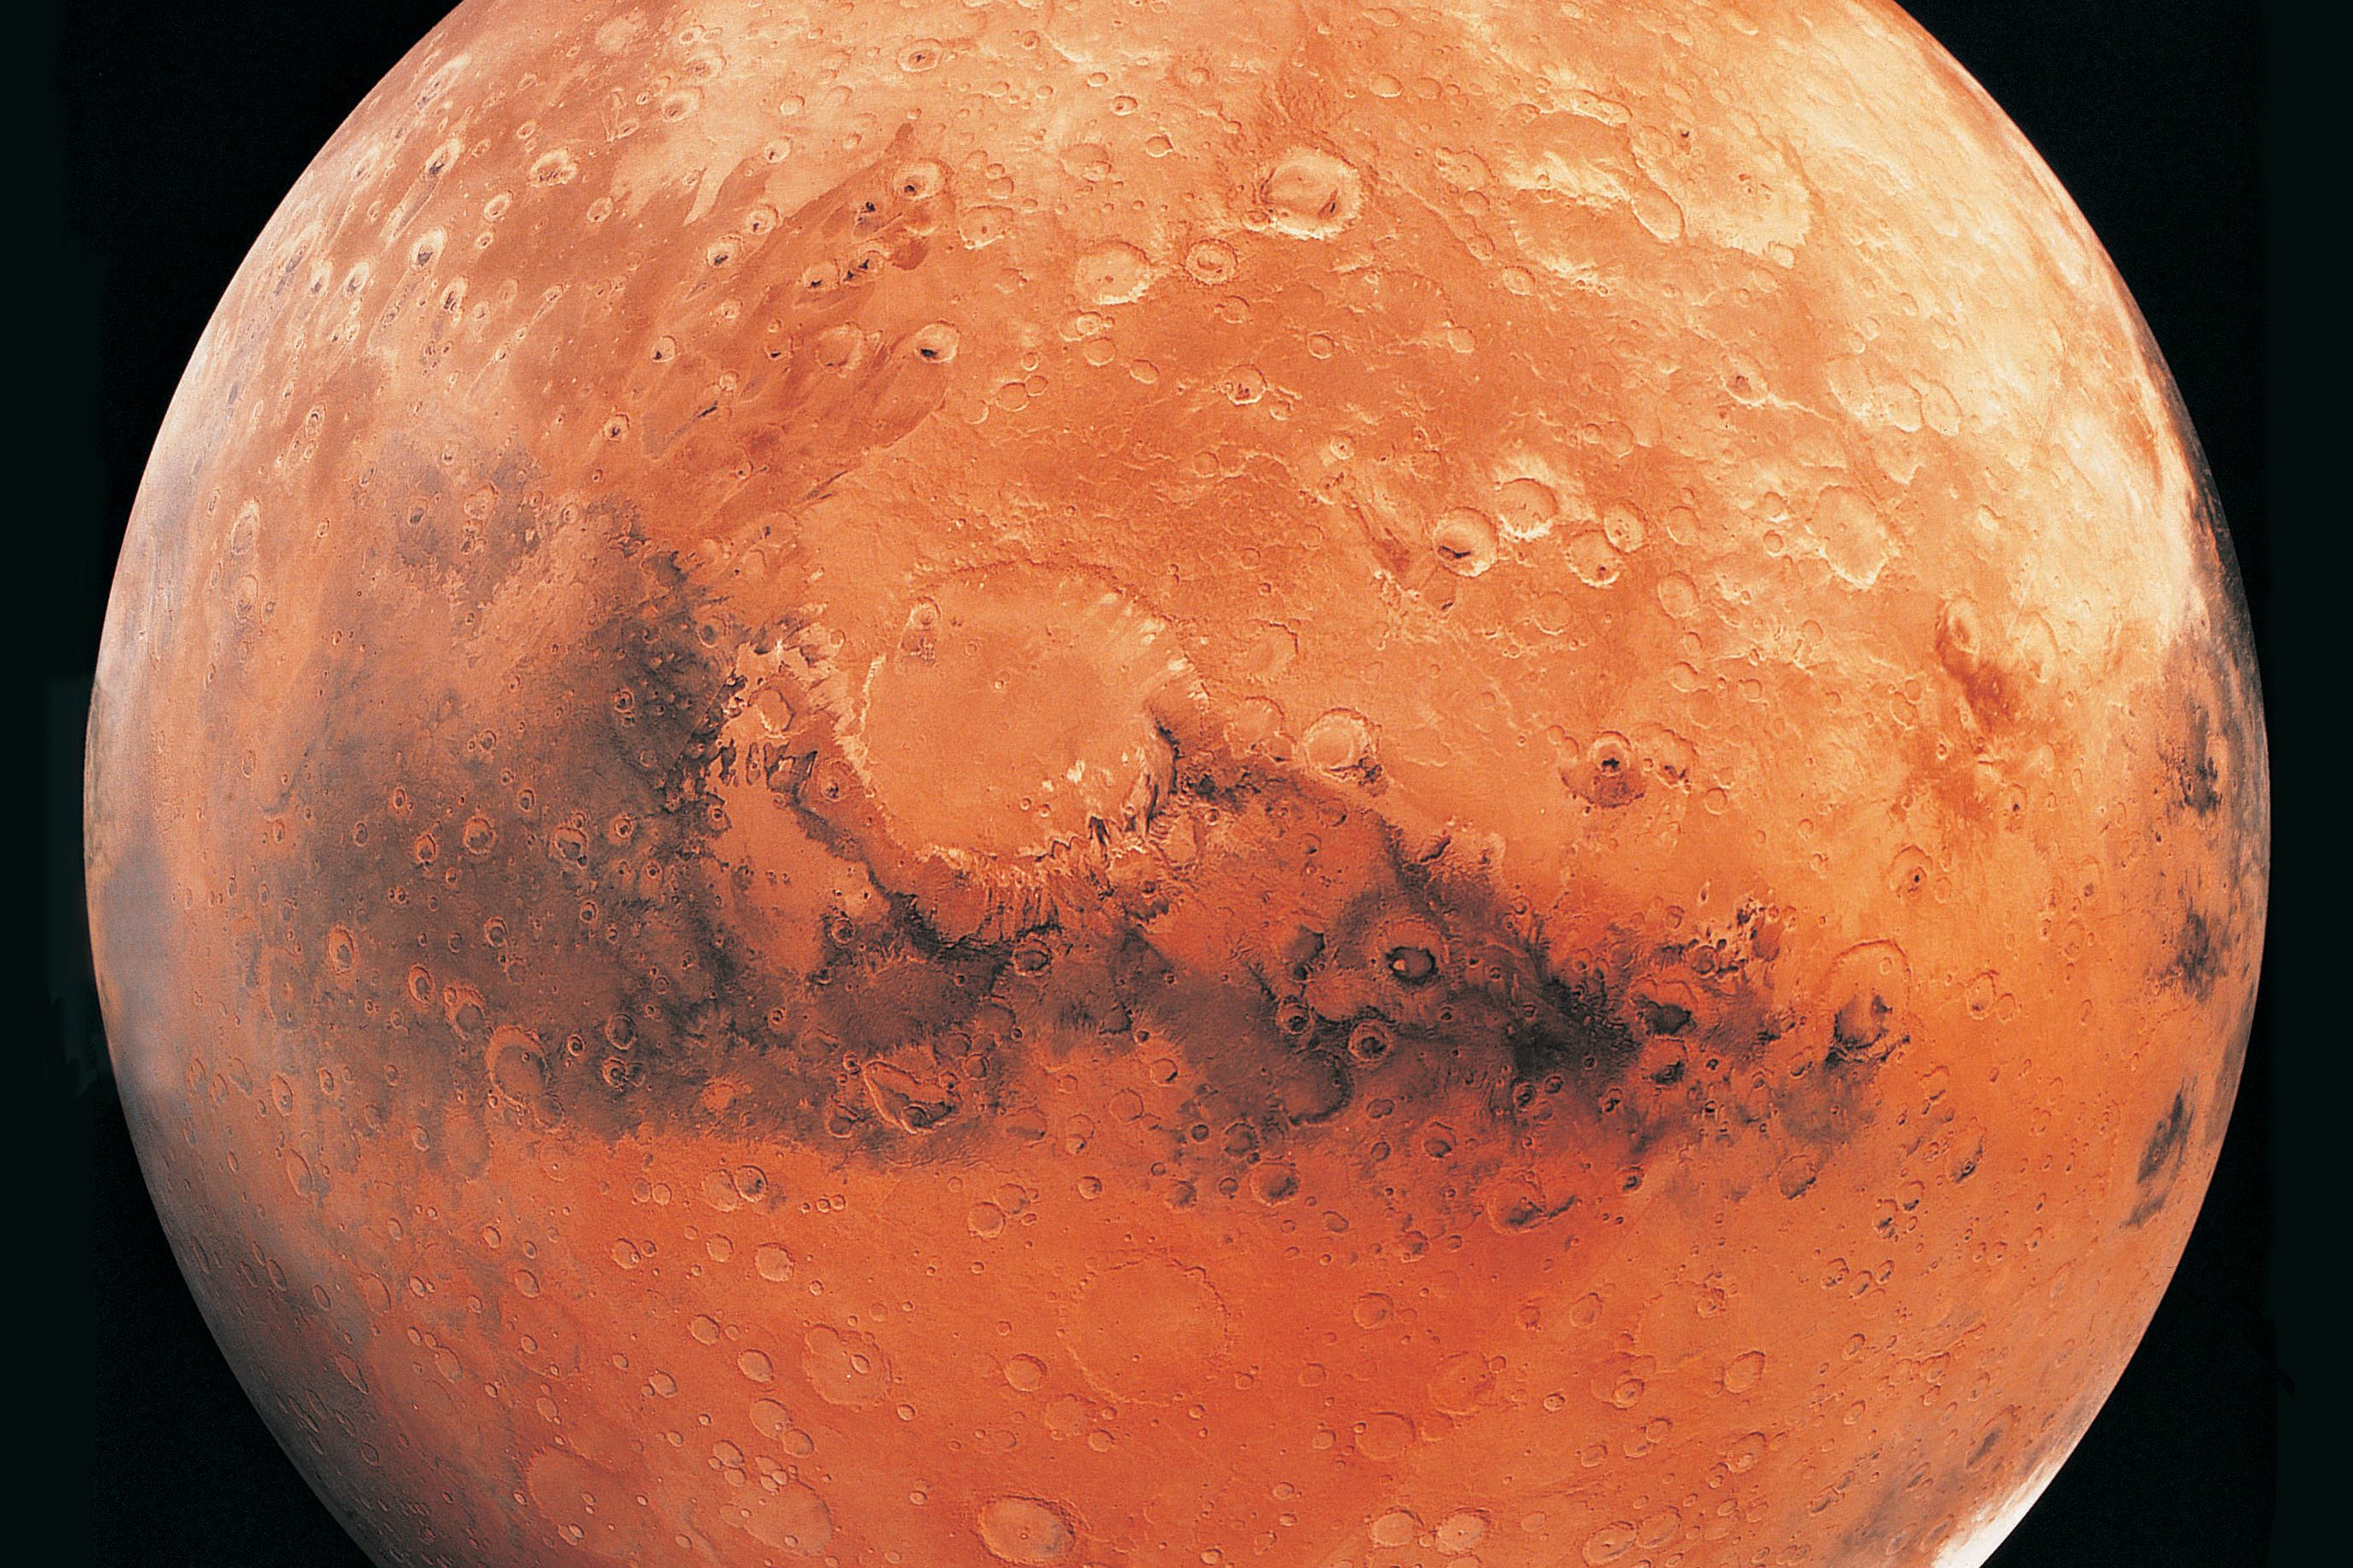 NASA Rover on Mars May Have Found Evidence of Life - InsideHook